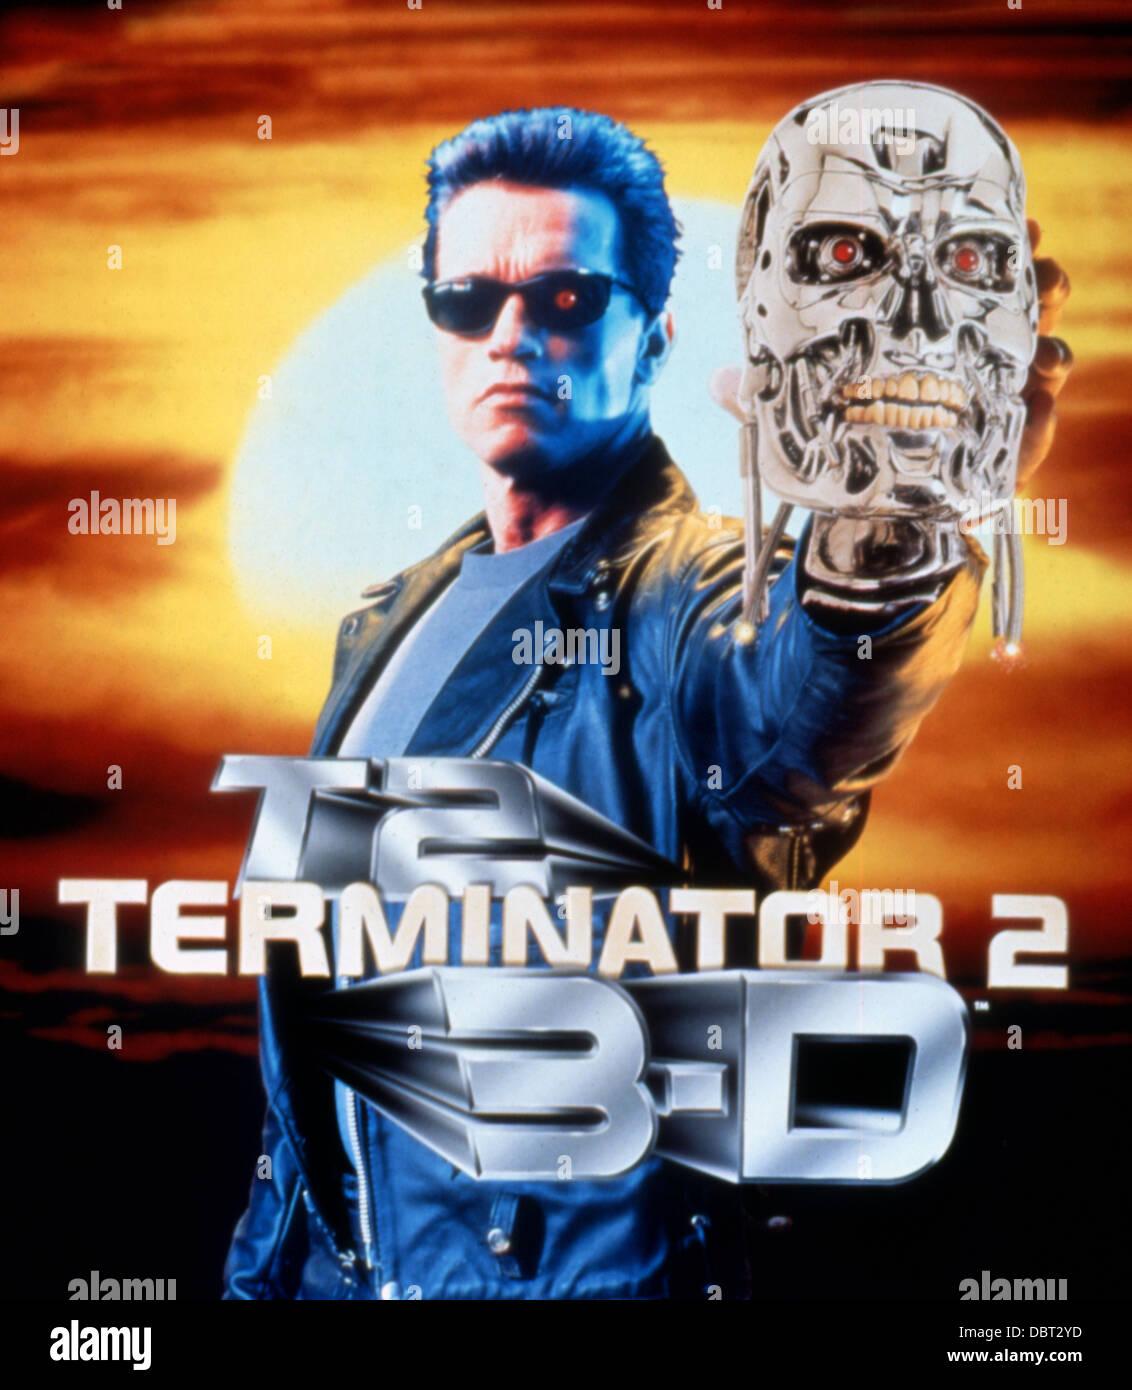 Universal studios florida terminator 2 3-d: battle across time.